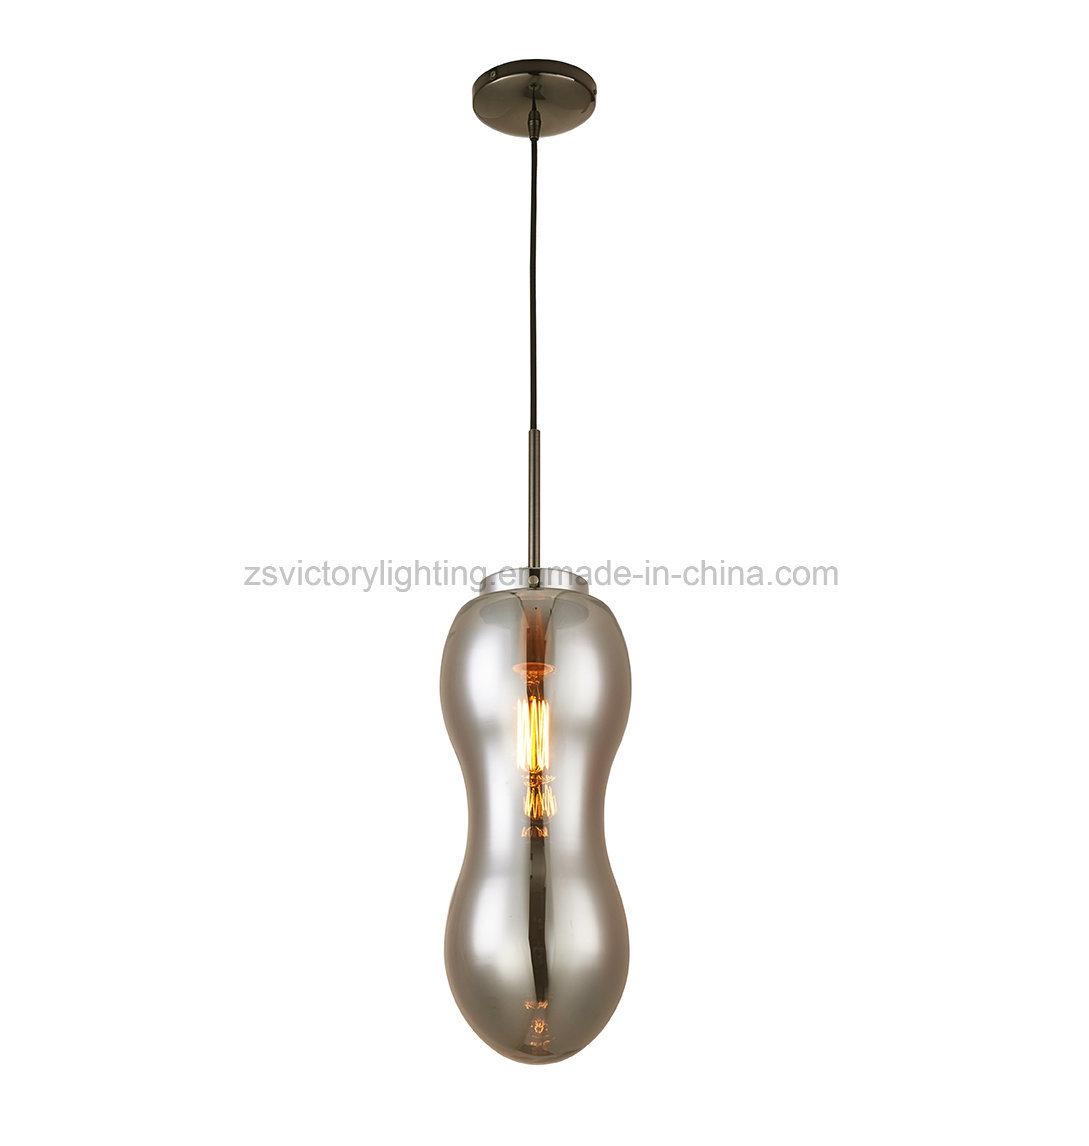 Modern Newest Design Glass Chandelier LED Pendant Lights Lamp